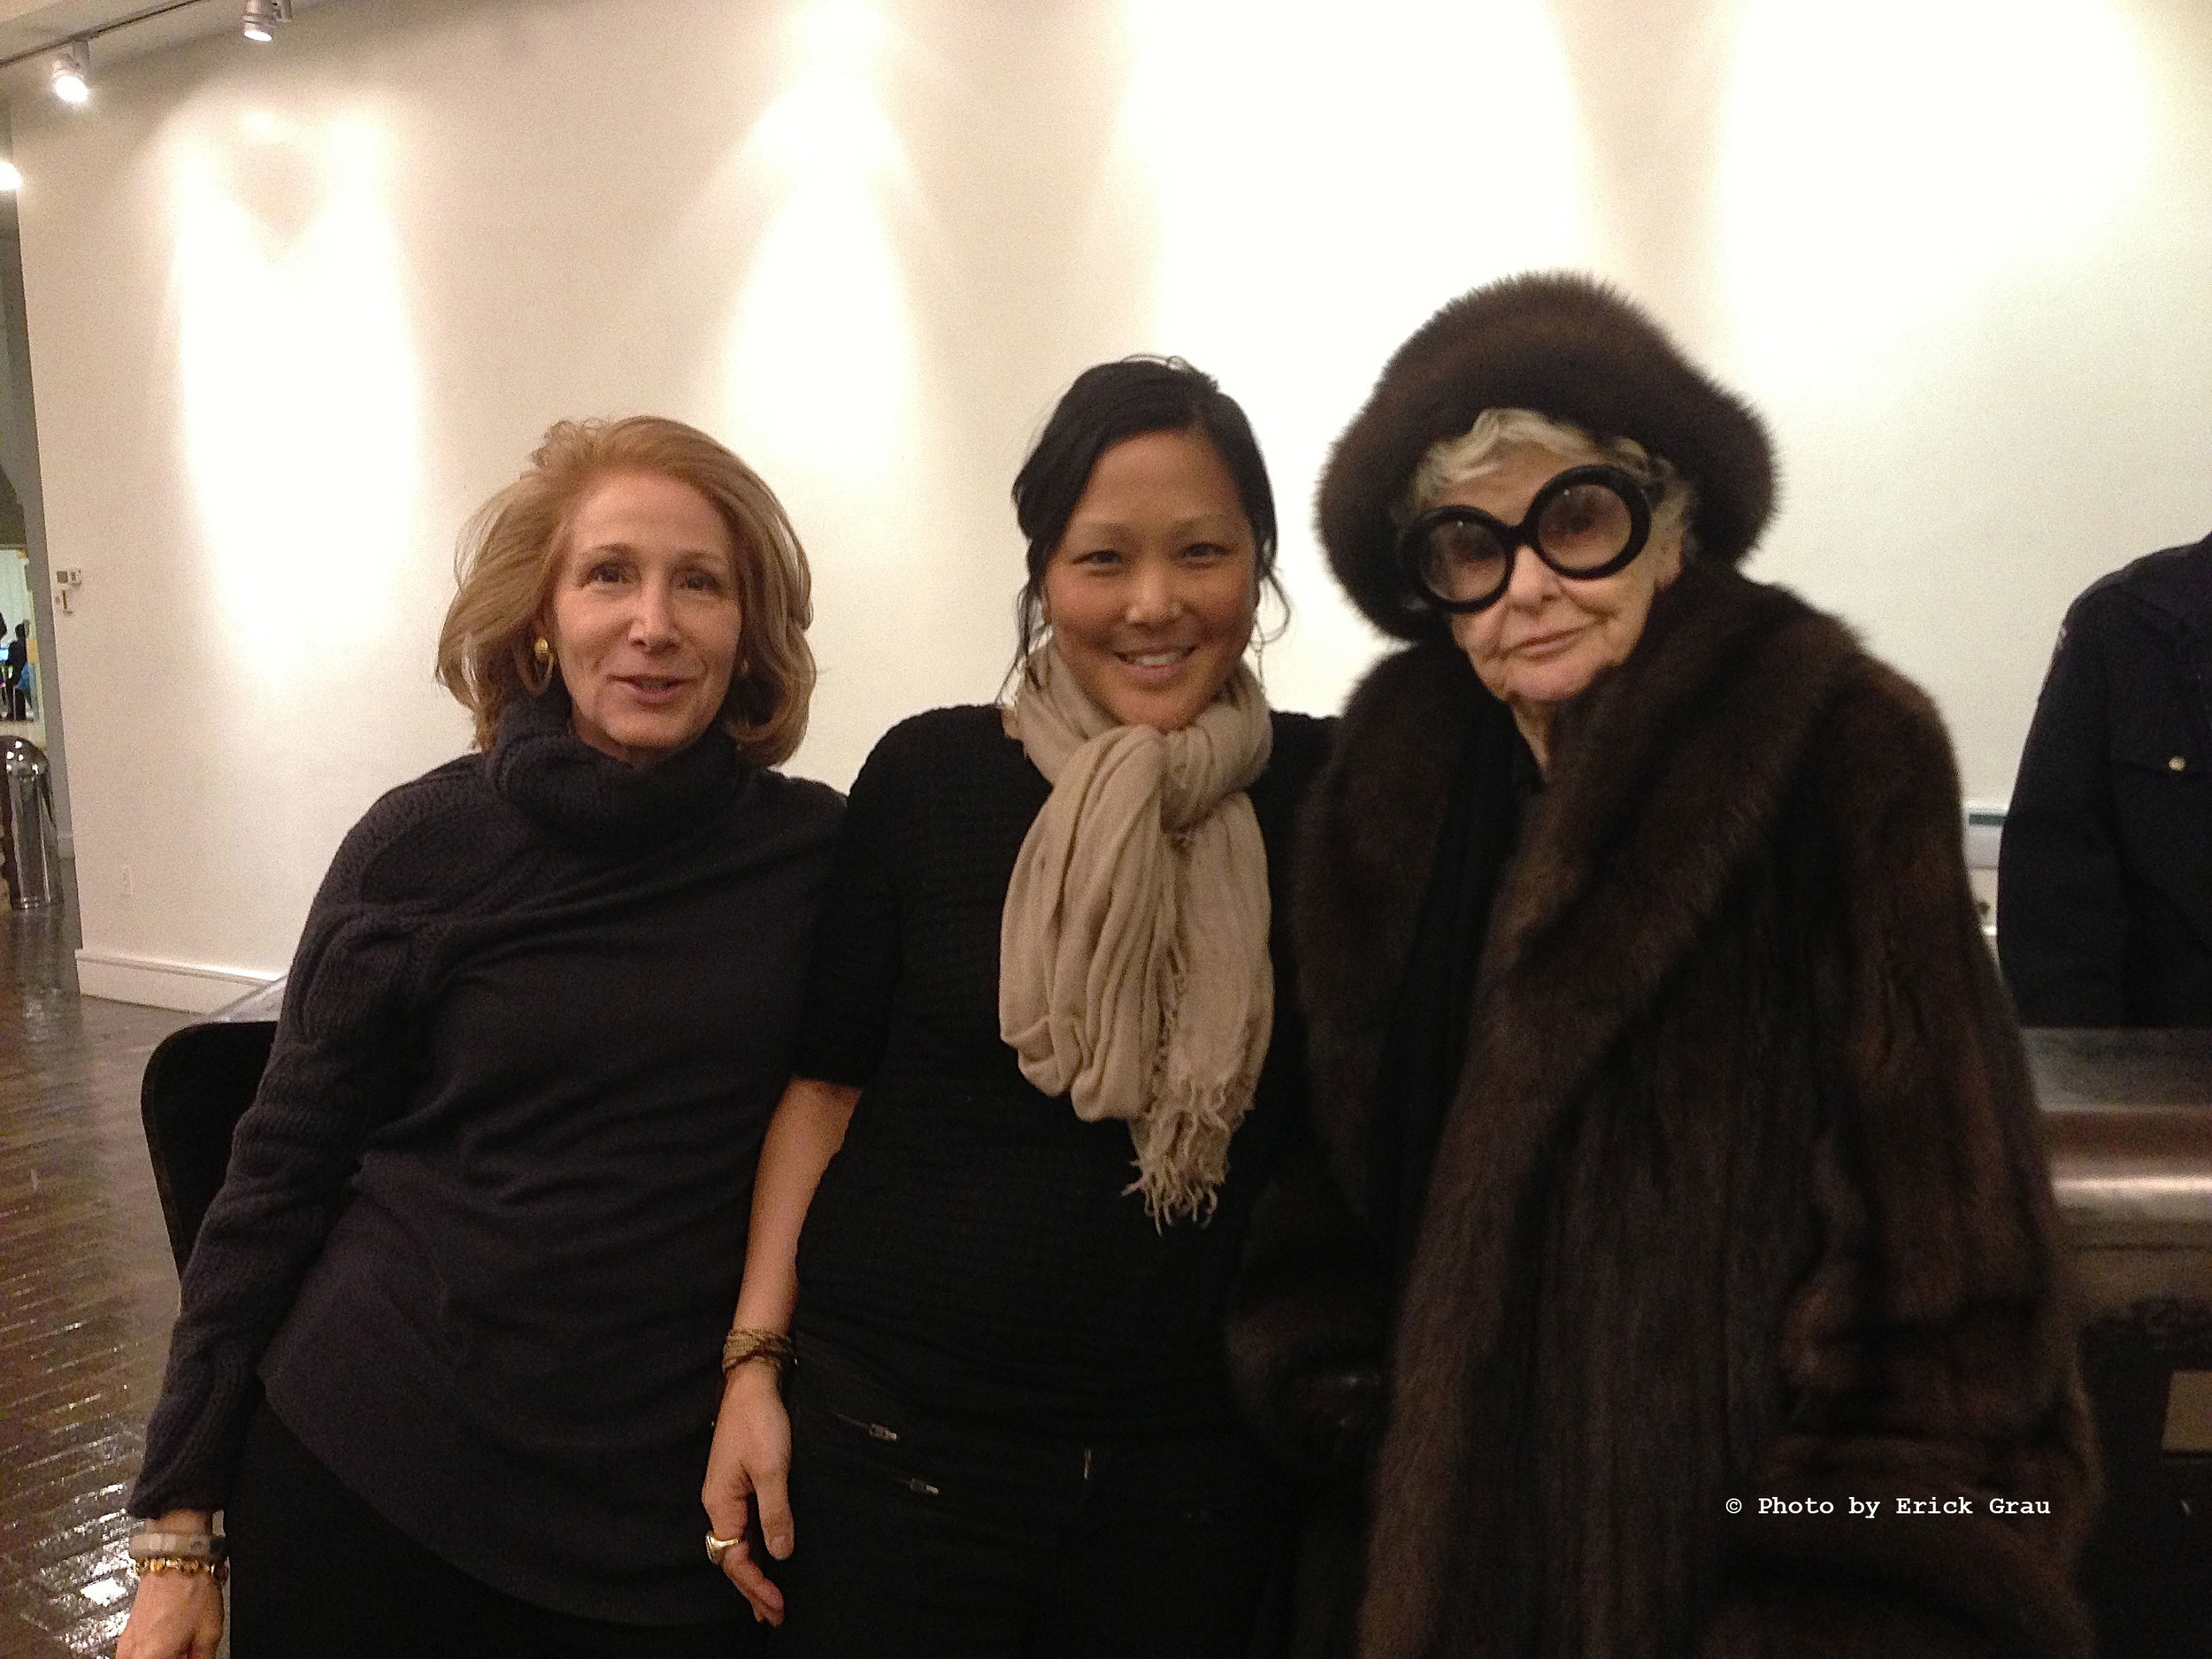 Elizabeth Hemmerdinger (Left), Chiemi Karasawa (Center), & Elaine Stritch (Right)